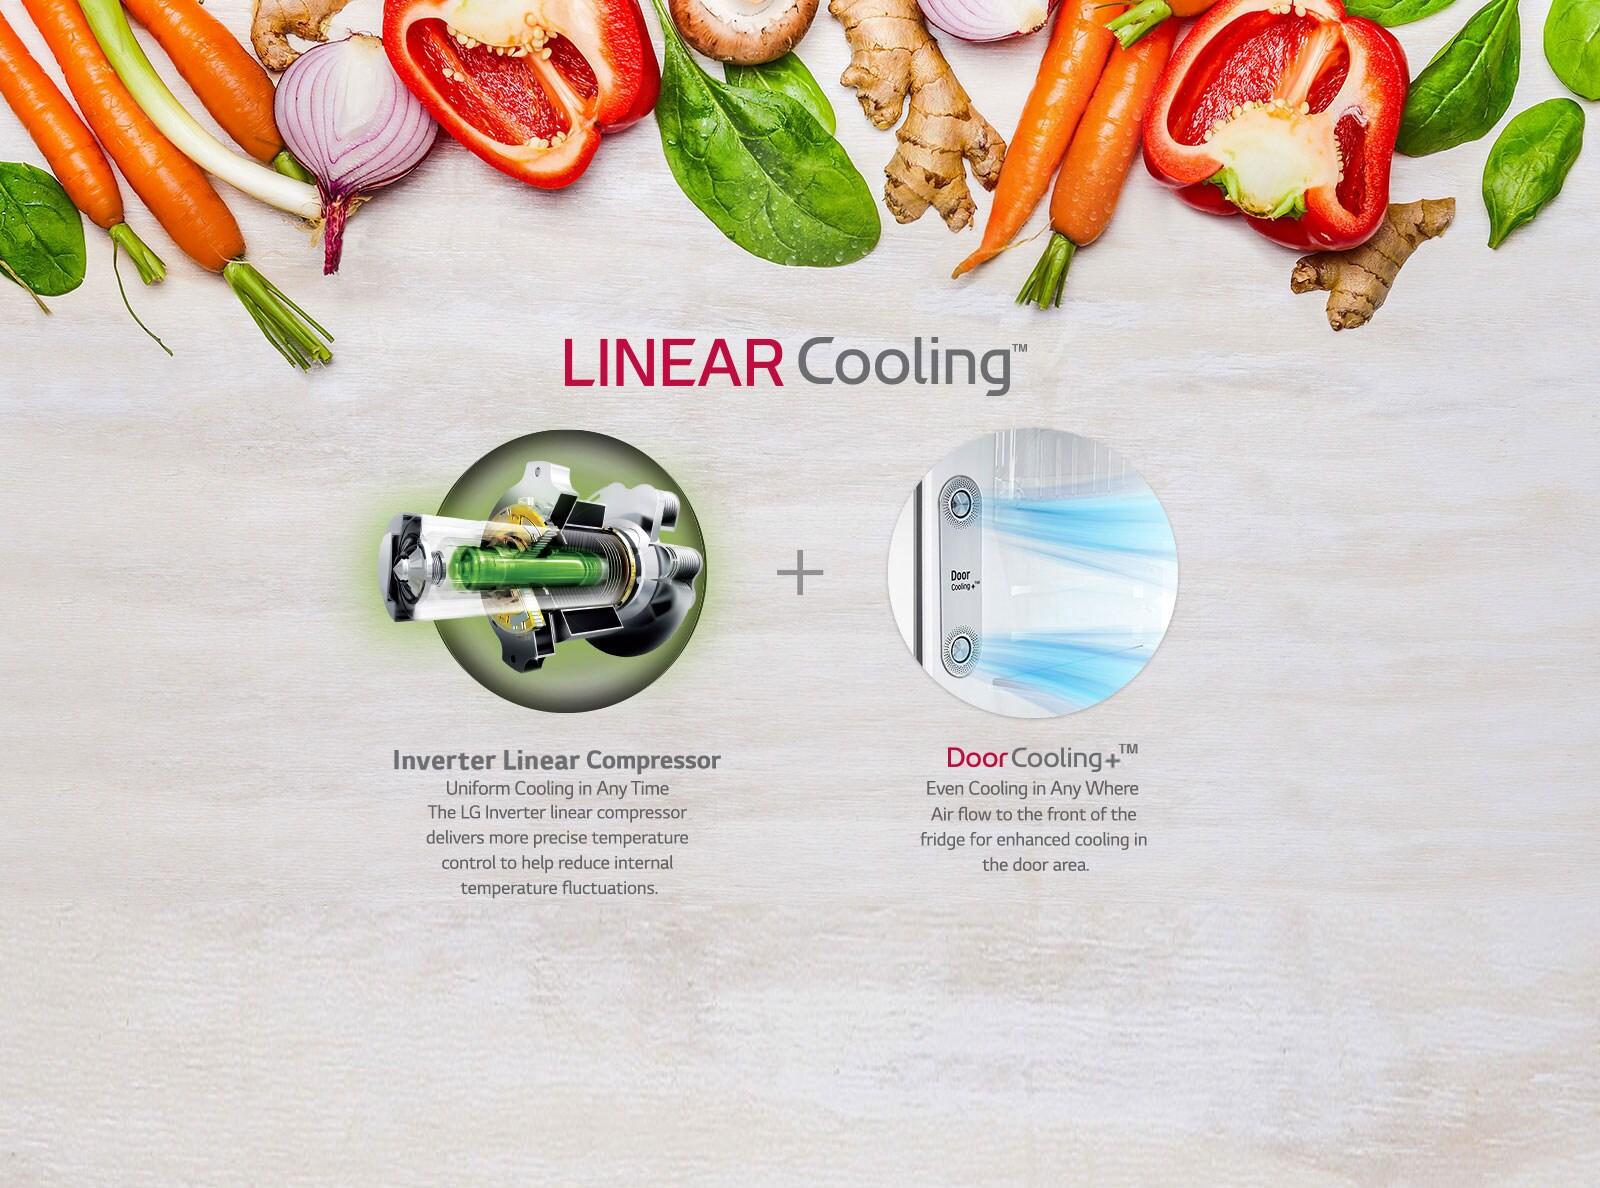 LG GL-T402JPZ3 360 Ltr Linear Cooling